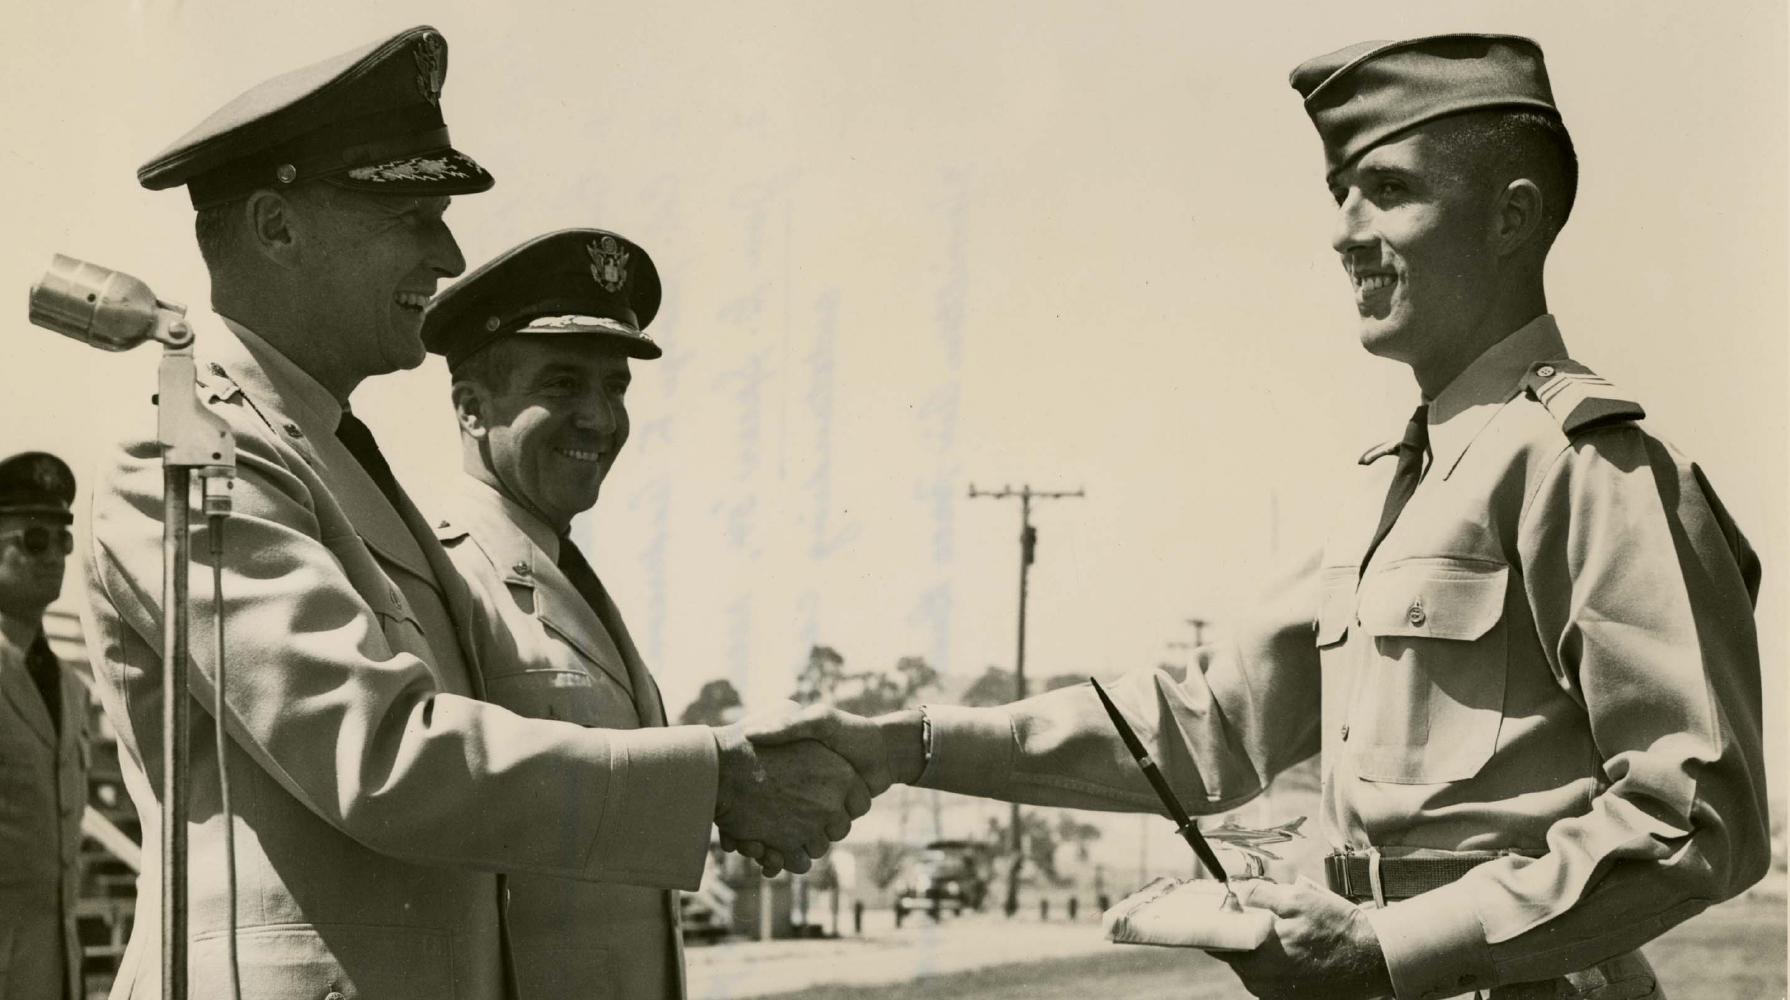 Capt. Jon M. Speer '54